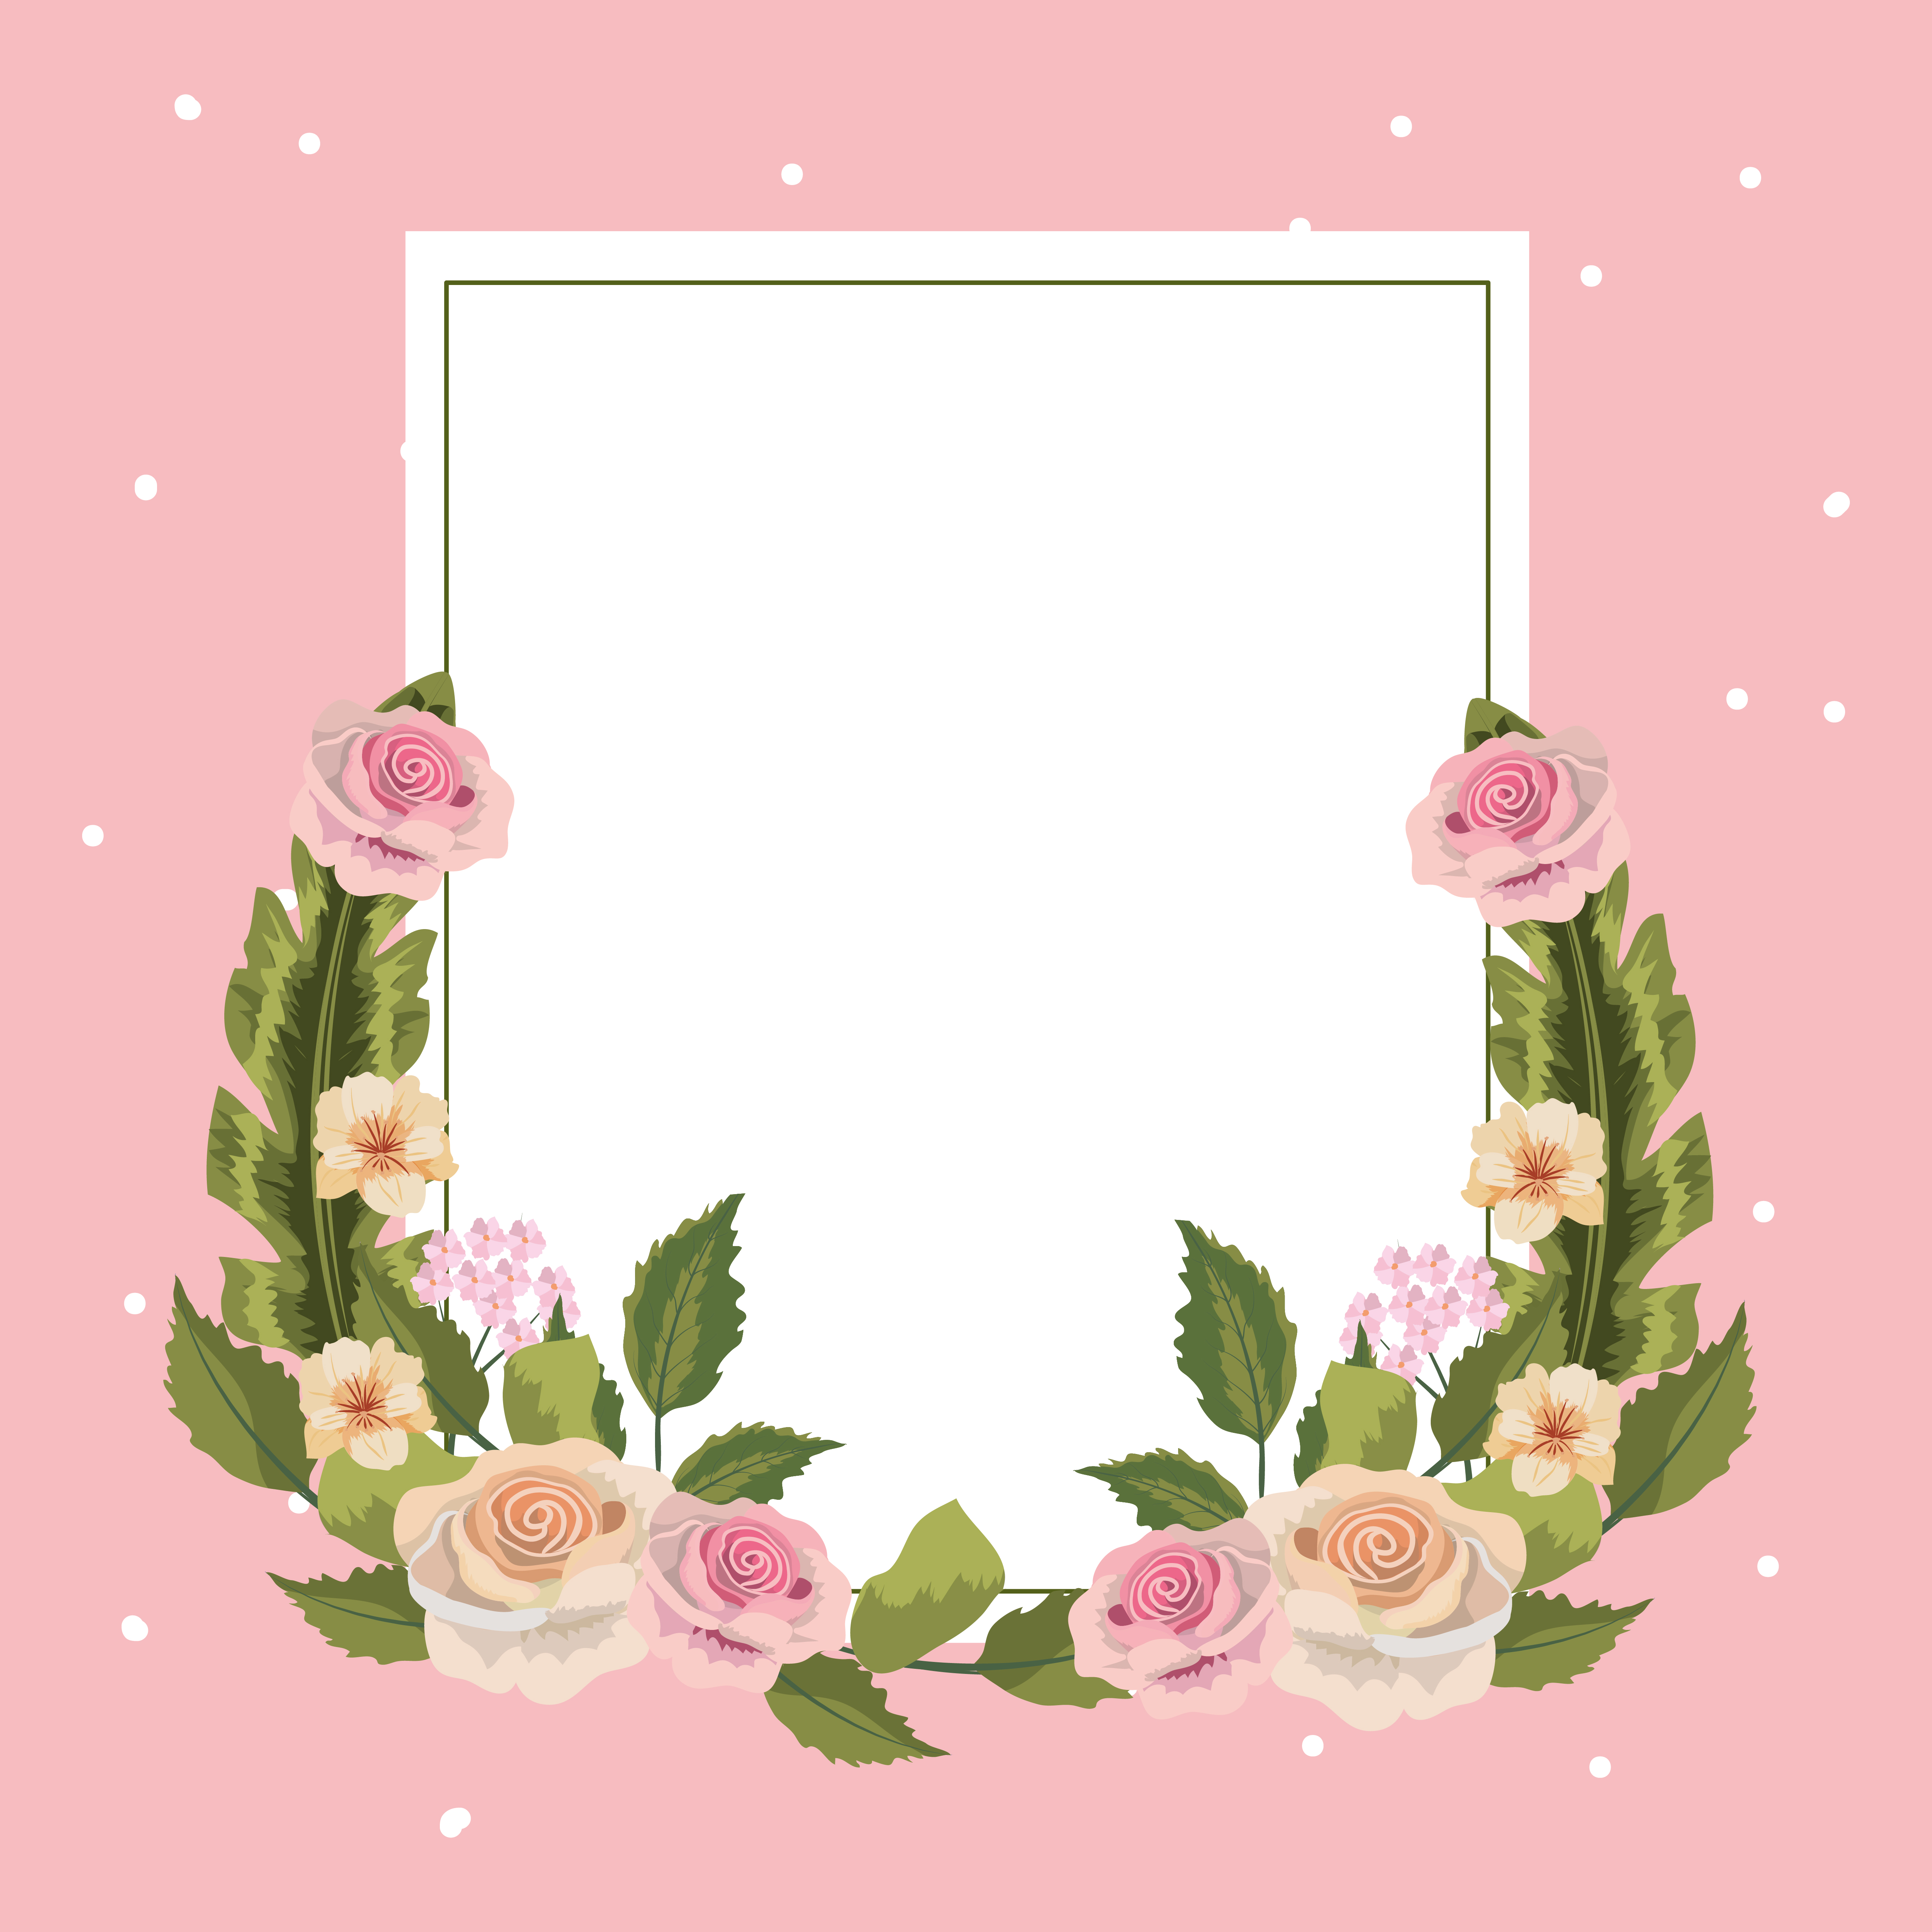 Vintage Floral Square Frame Download Free Vectors Clipart